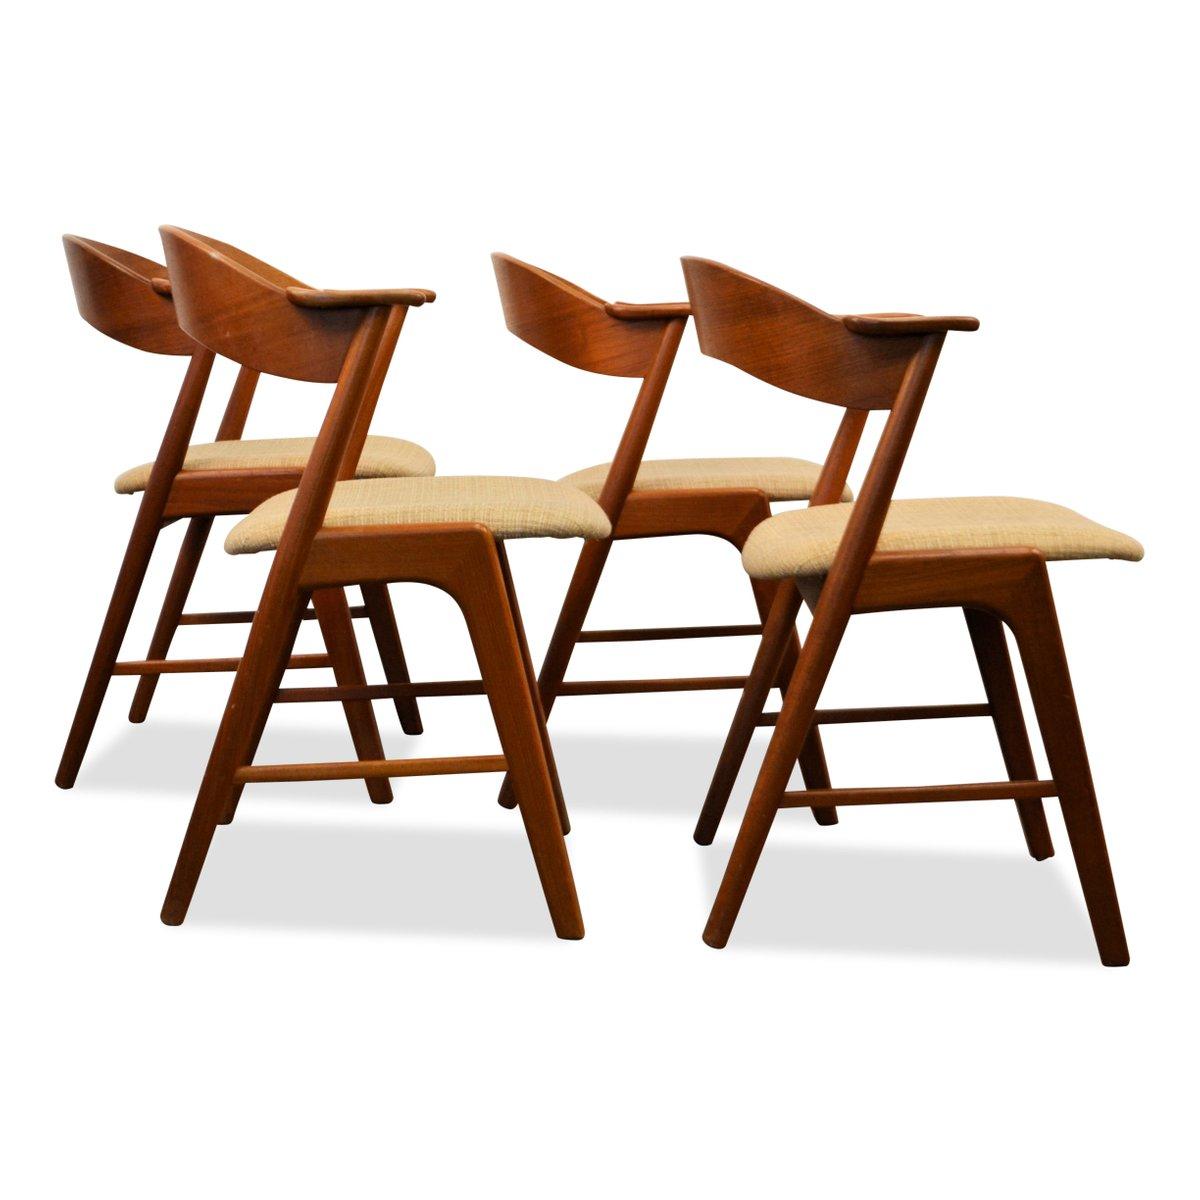 midcentury dining chairs by kai kristiansen for ks møbler set  - midcentury dining chairs by kai kristiansen for ks møbler set of